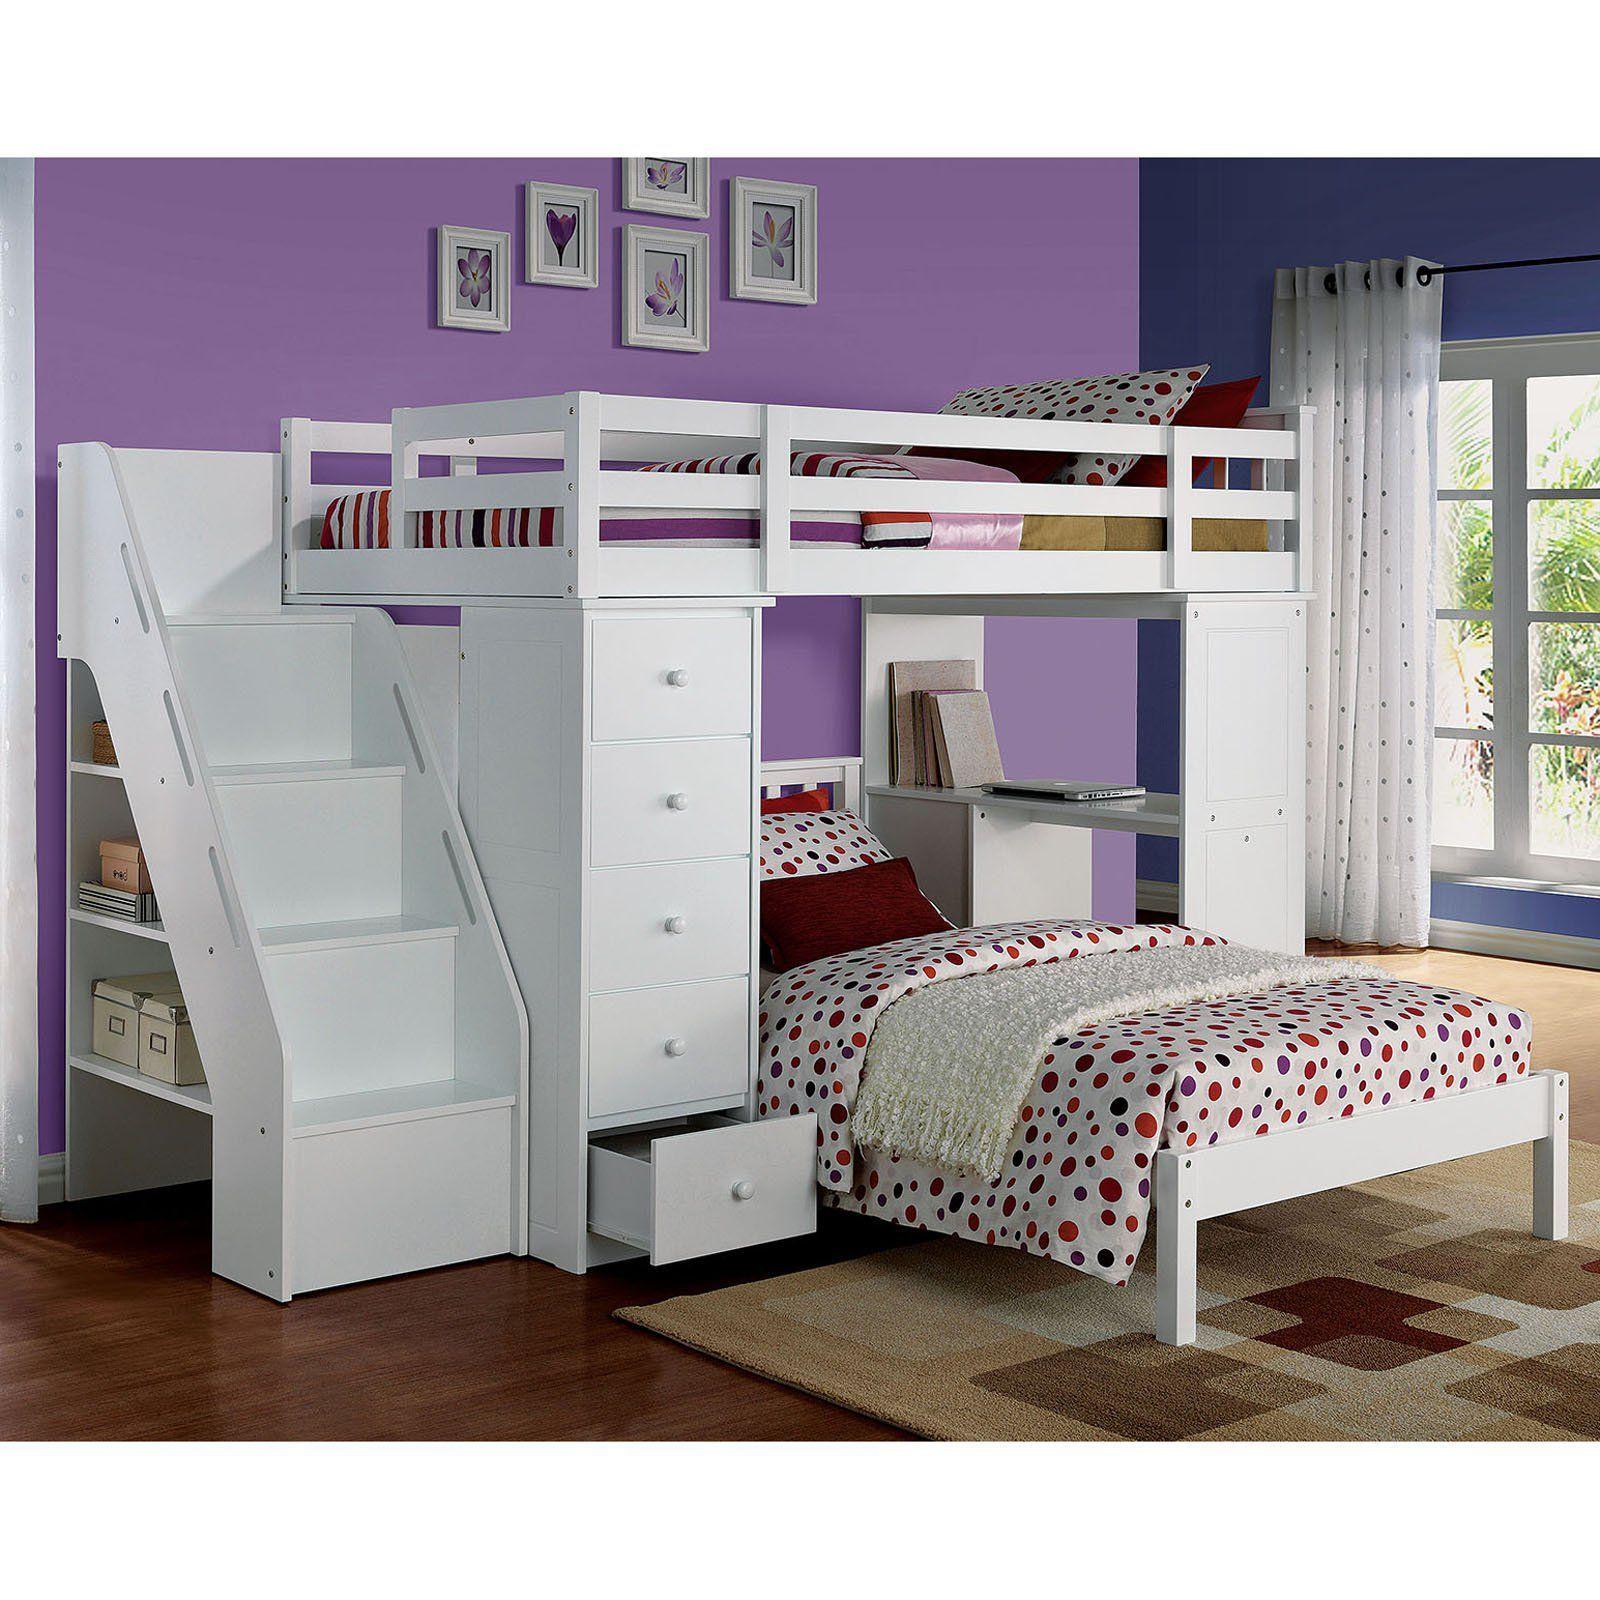 Acme Furniture Freya Loft Bed and Bookshelf Ladder White